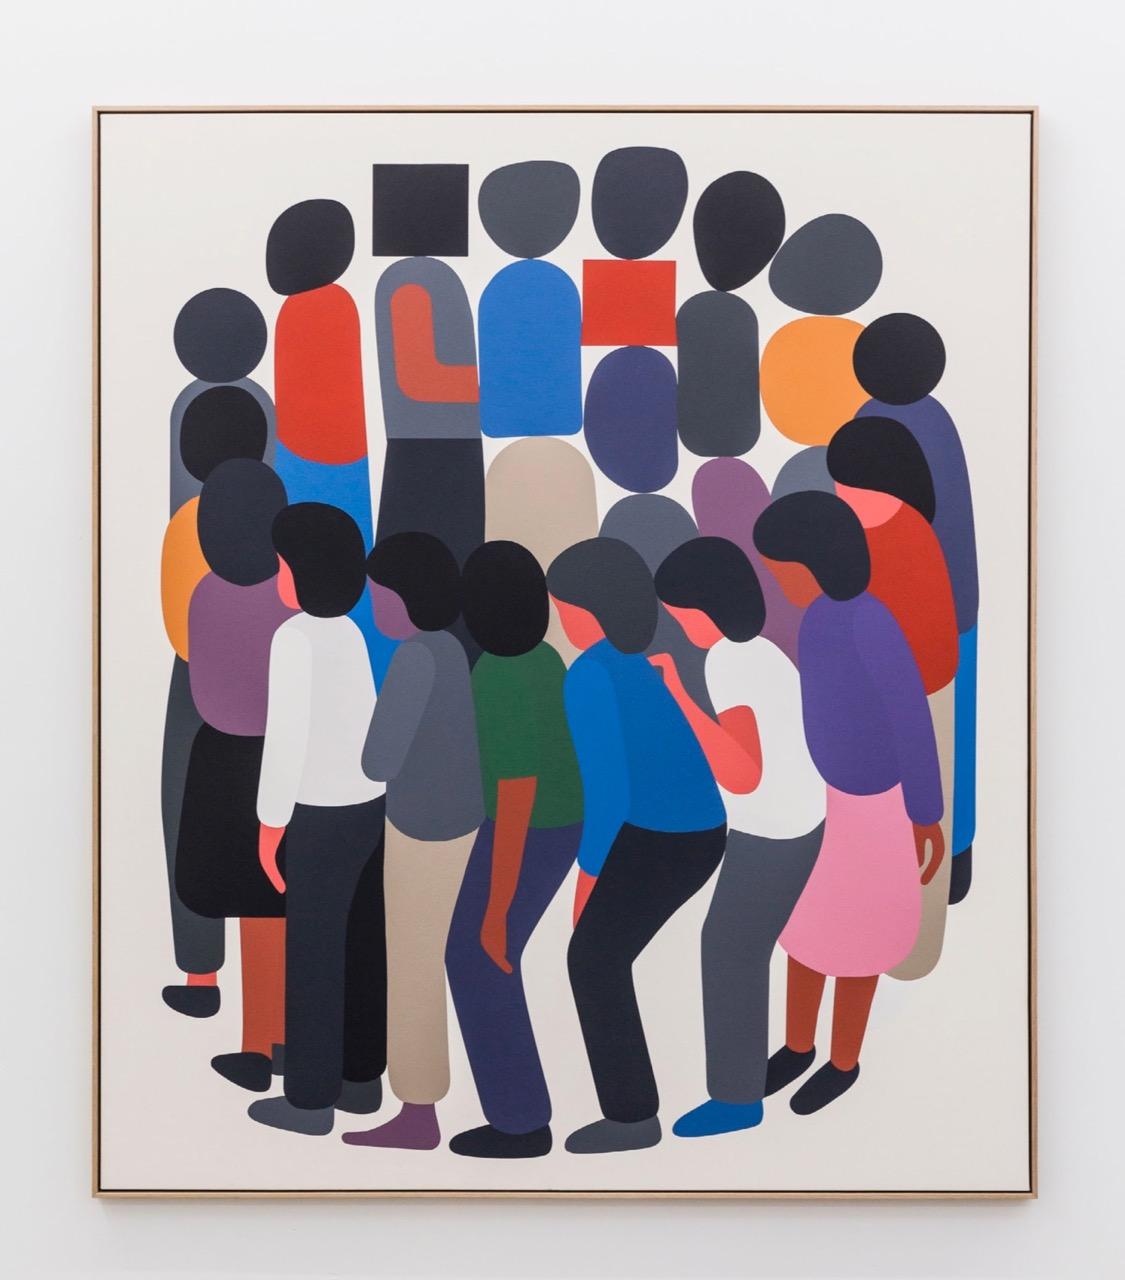 Geoff McFetridge Coming Back Is Half The Trip Eighteen Gallery